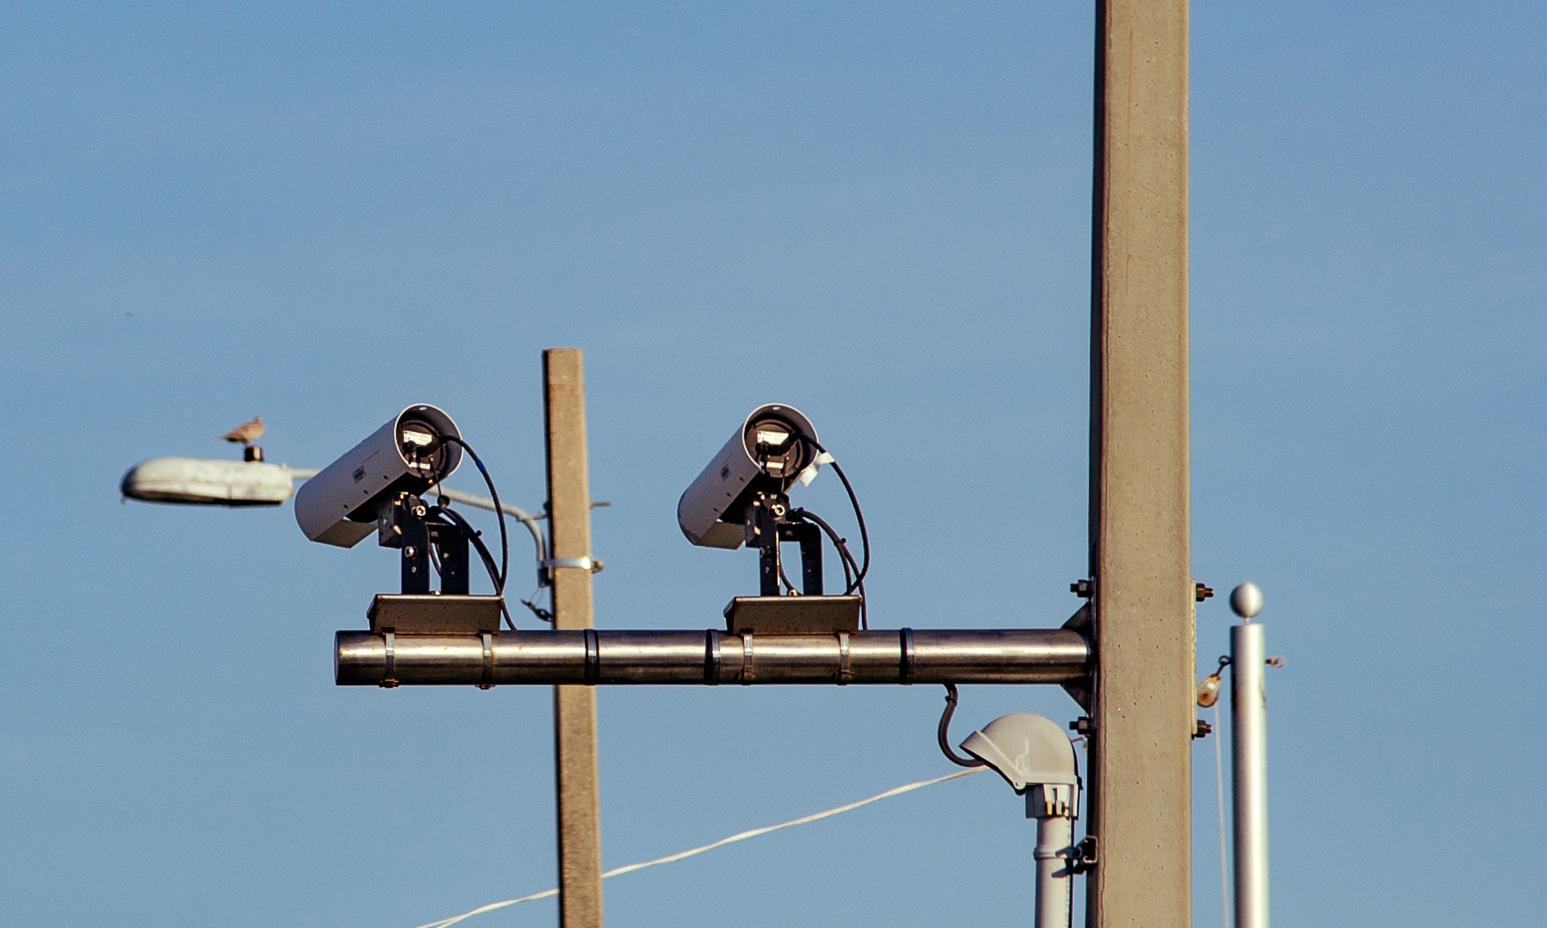 Automated license plate reader (ALPR/LPR) cameras scan license plates of cars crossing into Pensacola Beach, Florida